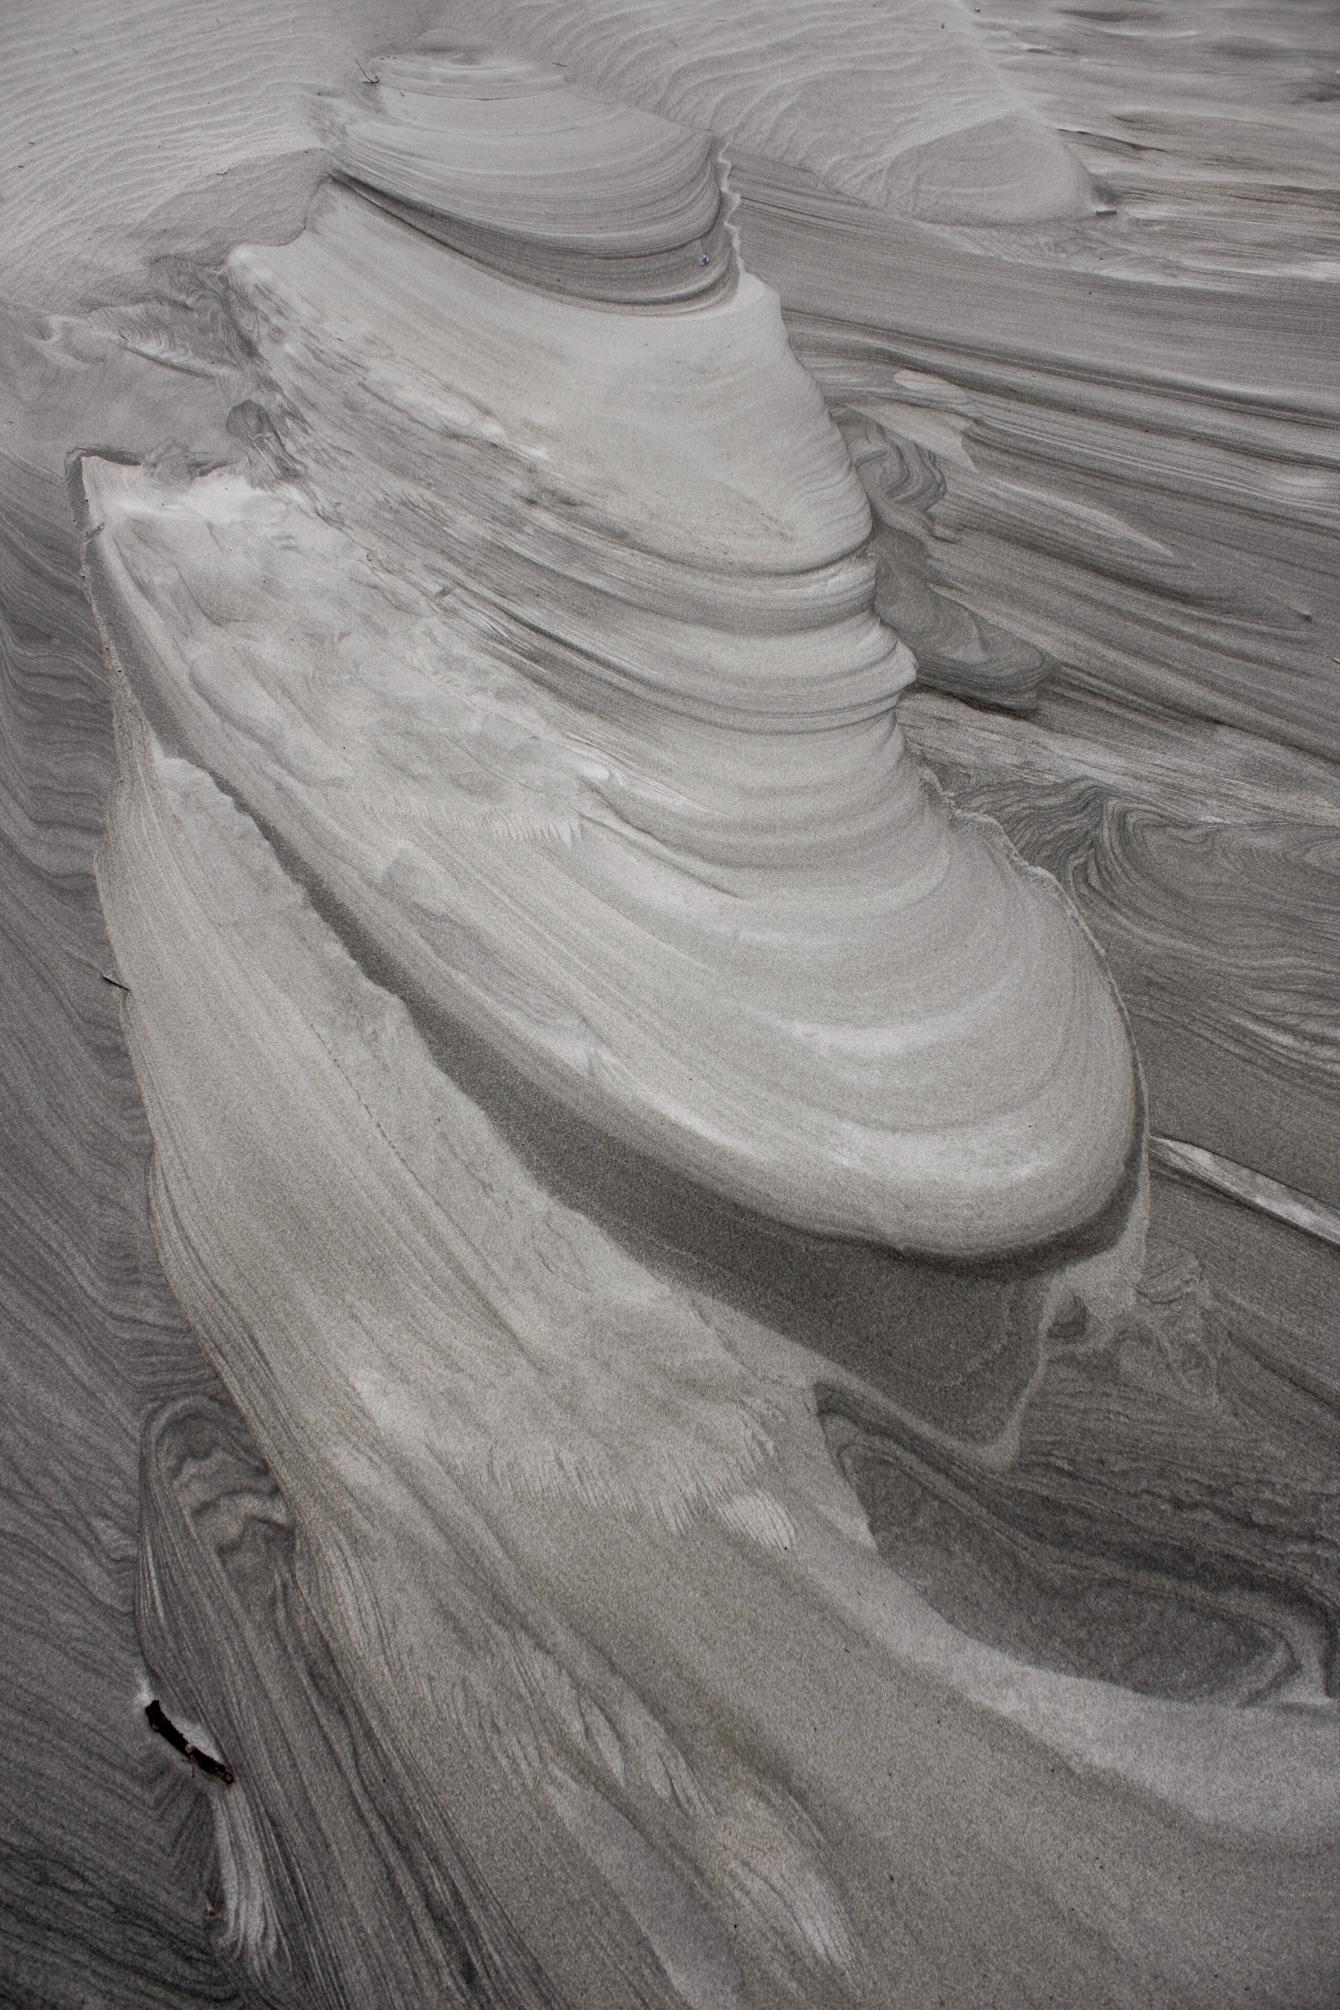 new-zealand-nz-black-sand-beaches